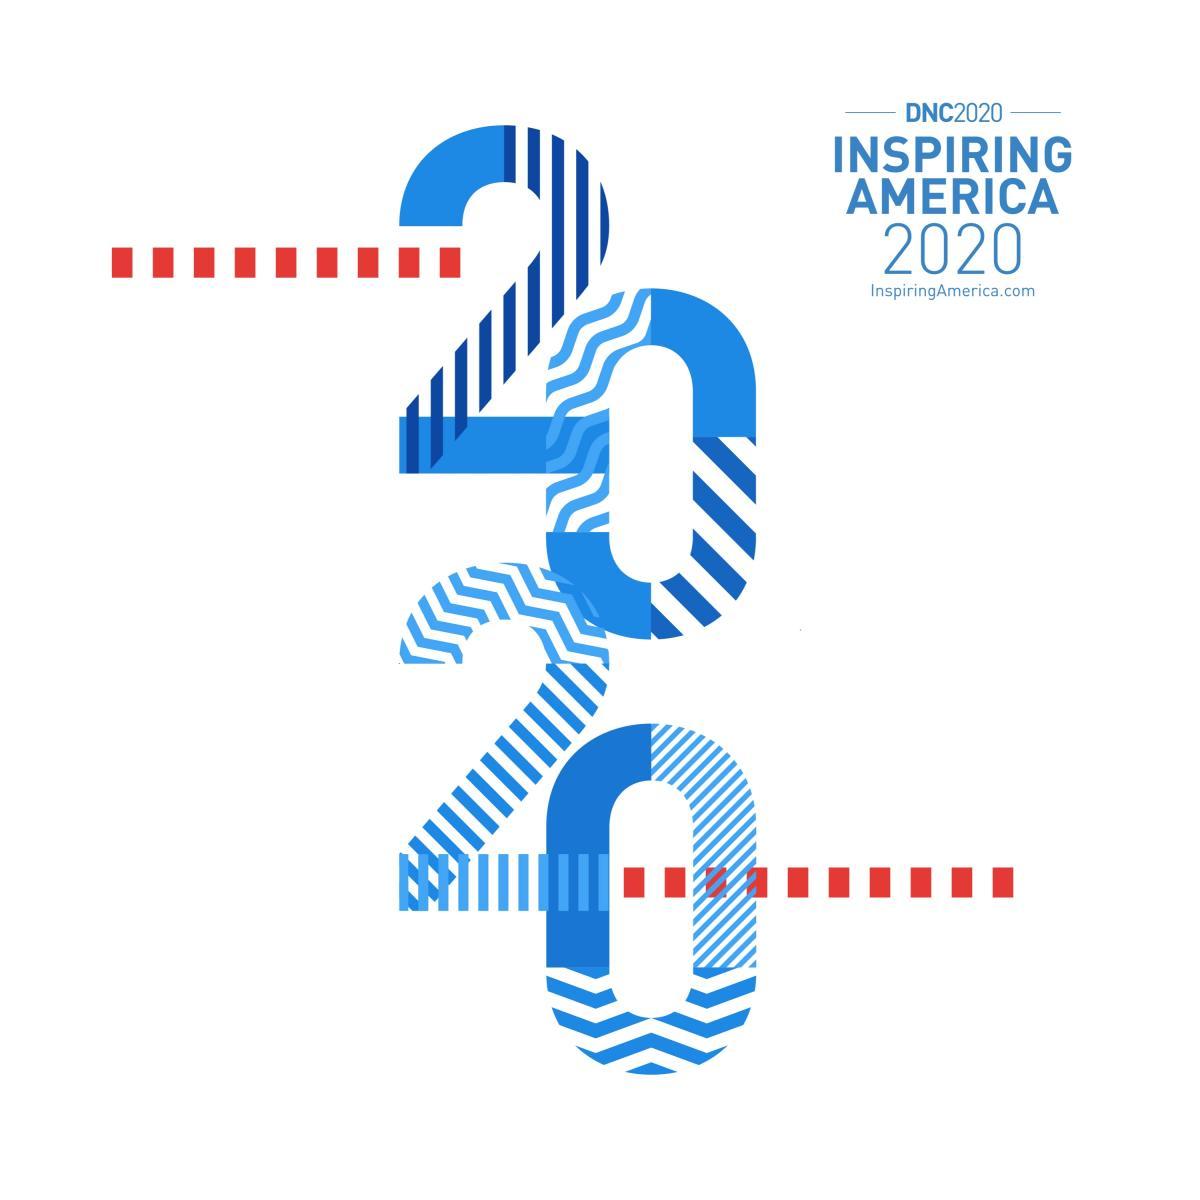 Inspiring America 2020